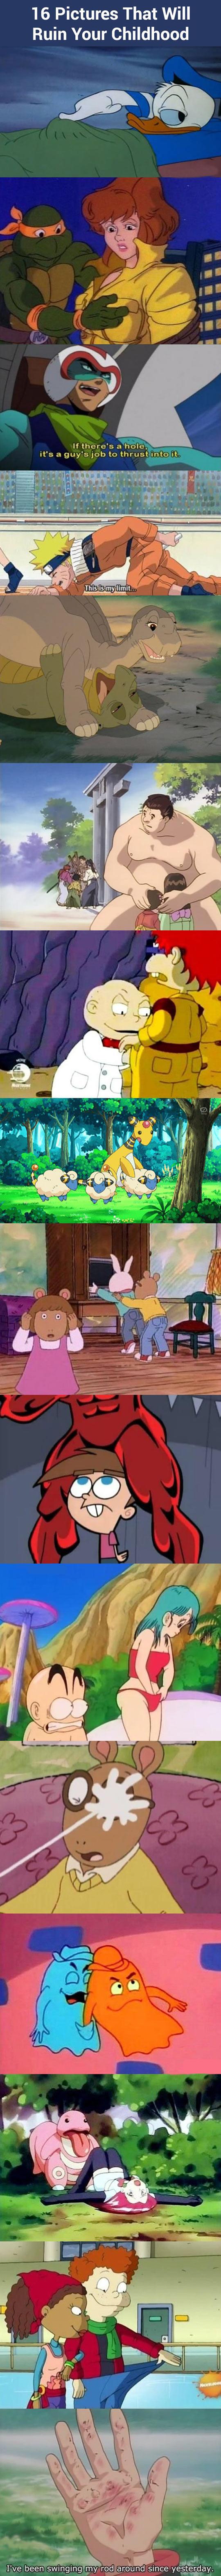 funny-Disney-movies-childhood-ruined